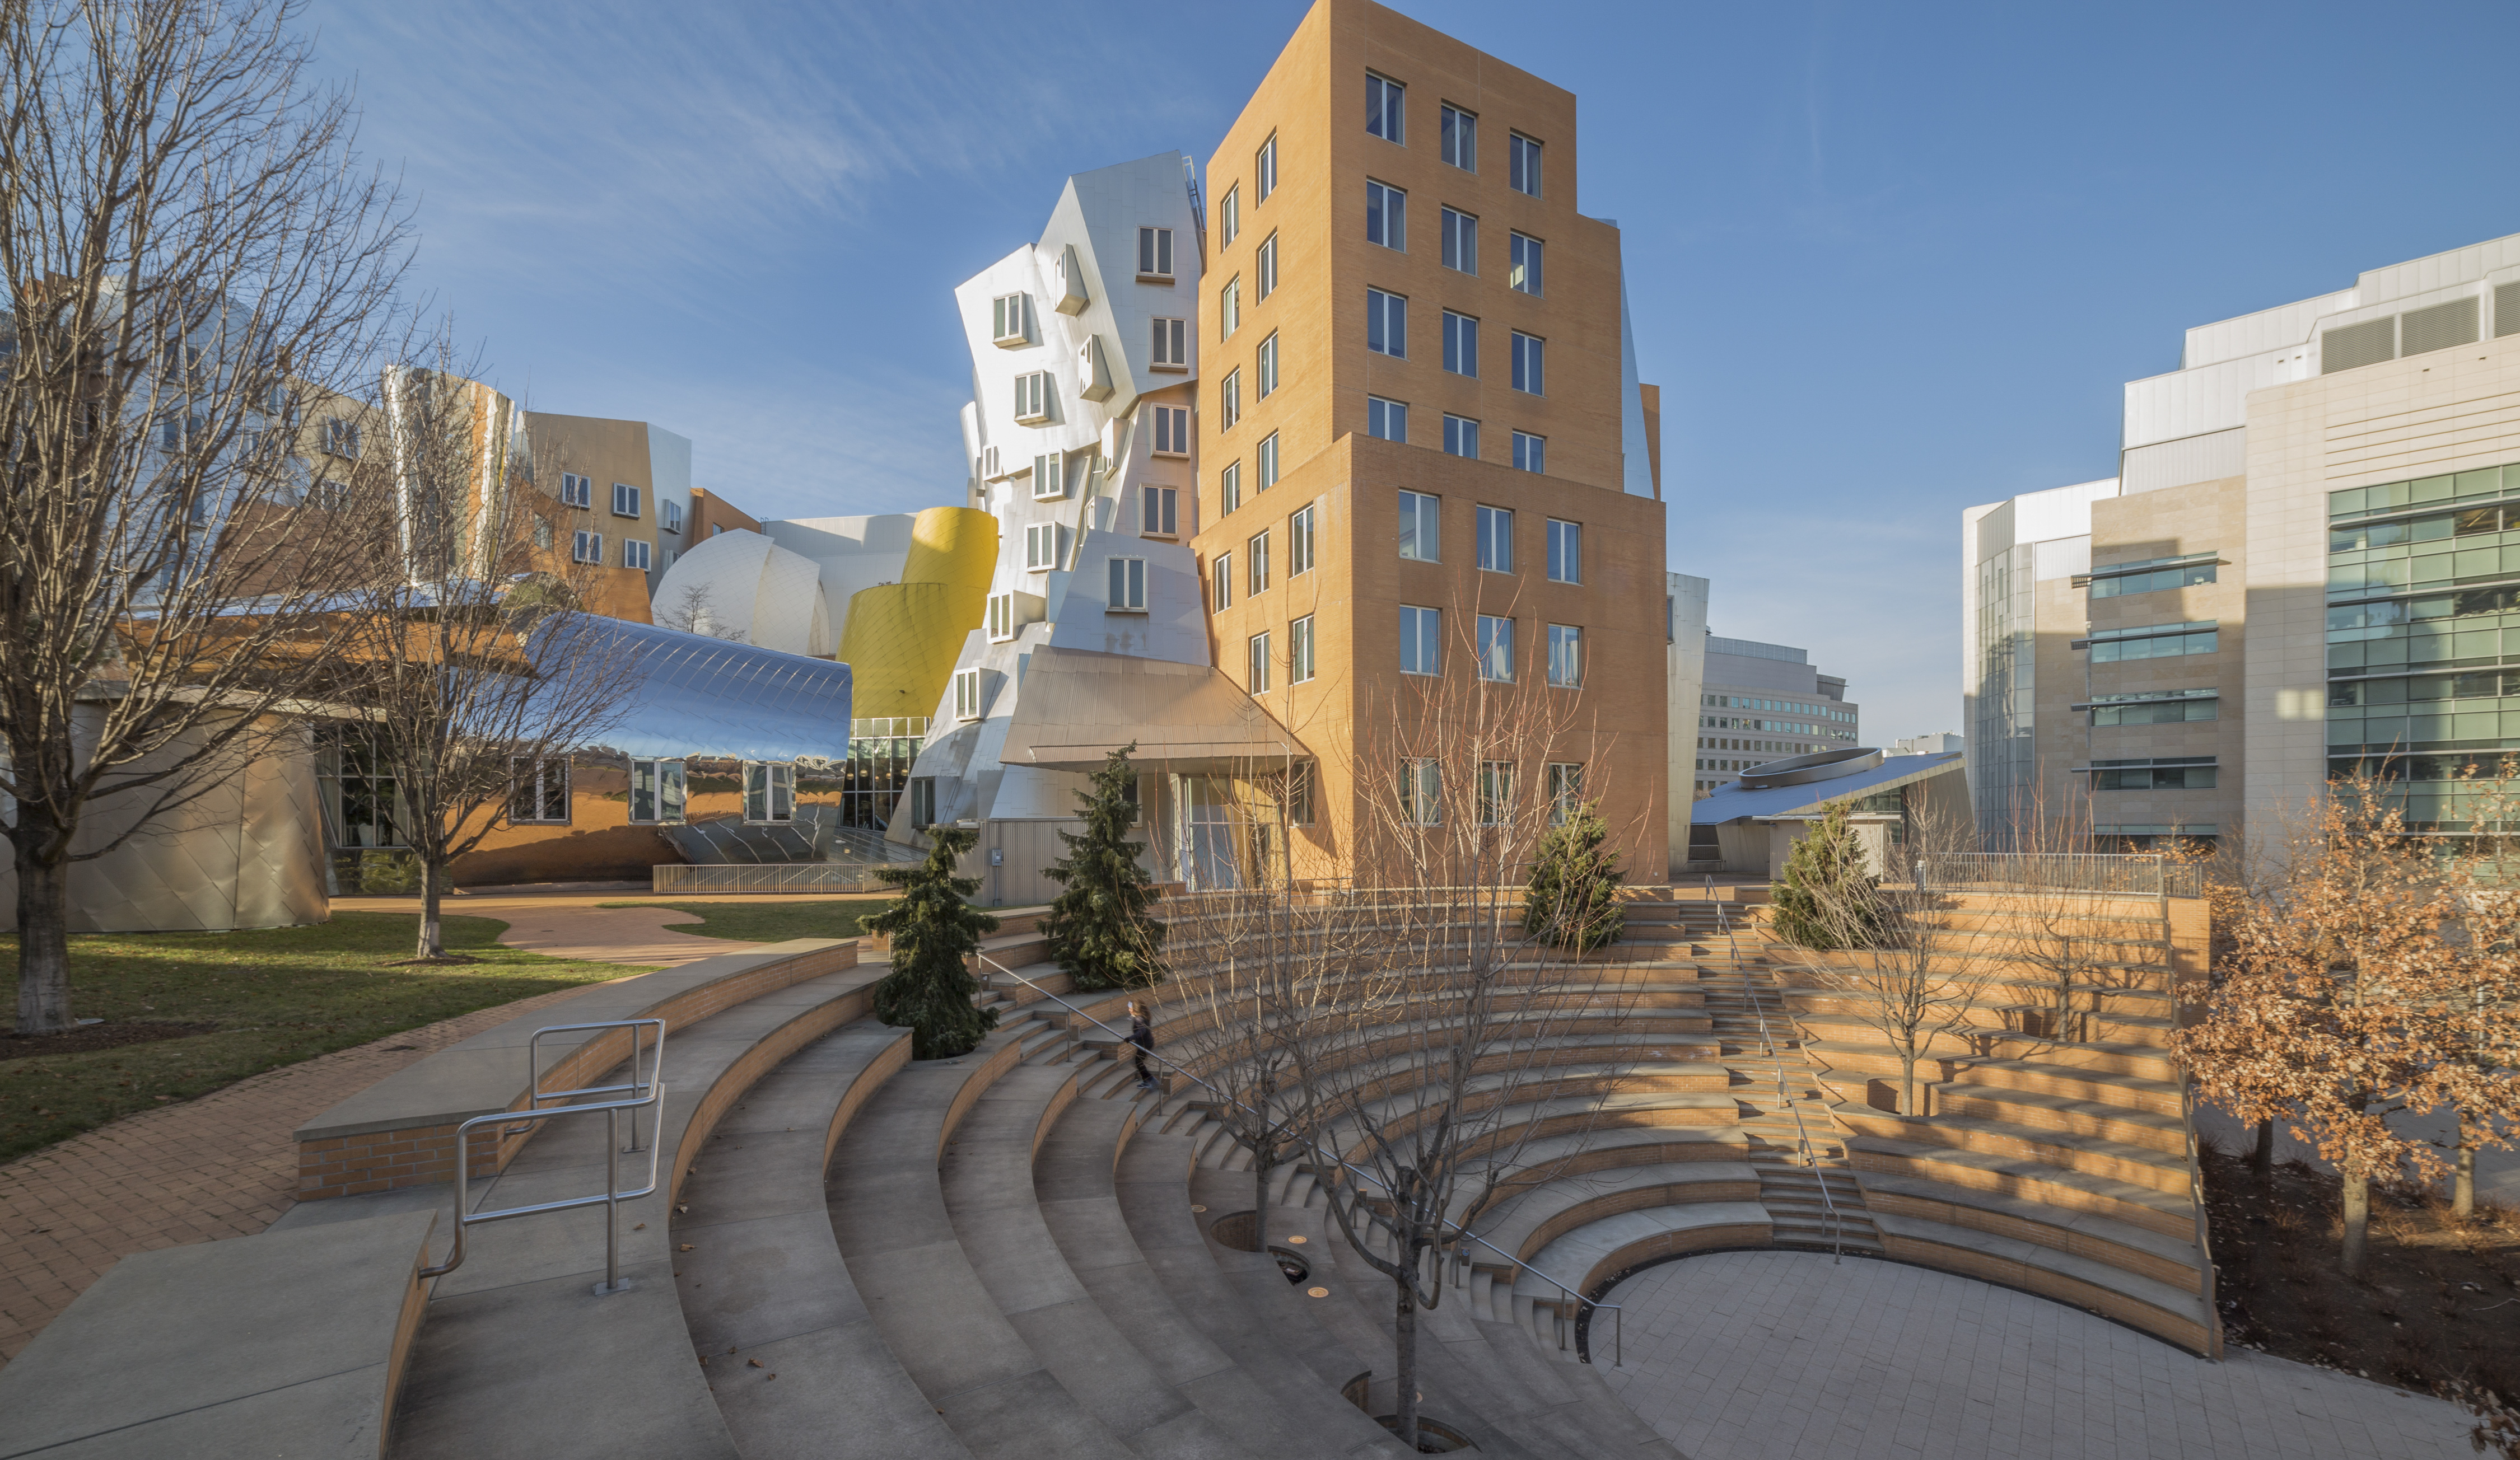 Stata Center at MIT in Cambridge, Massachusetts